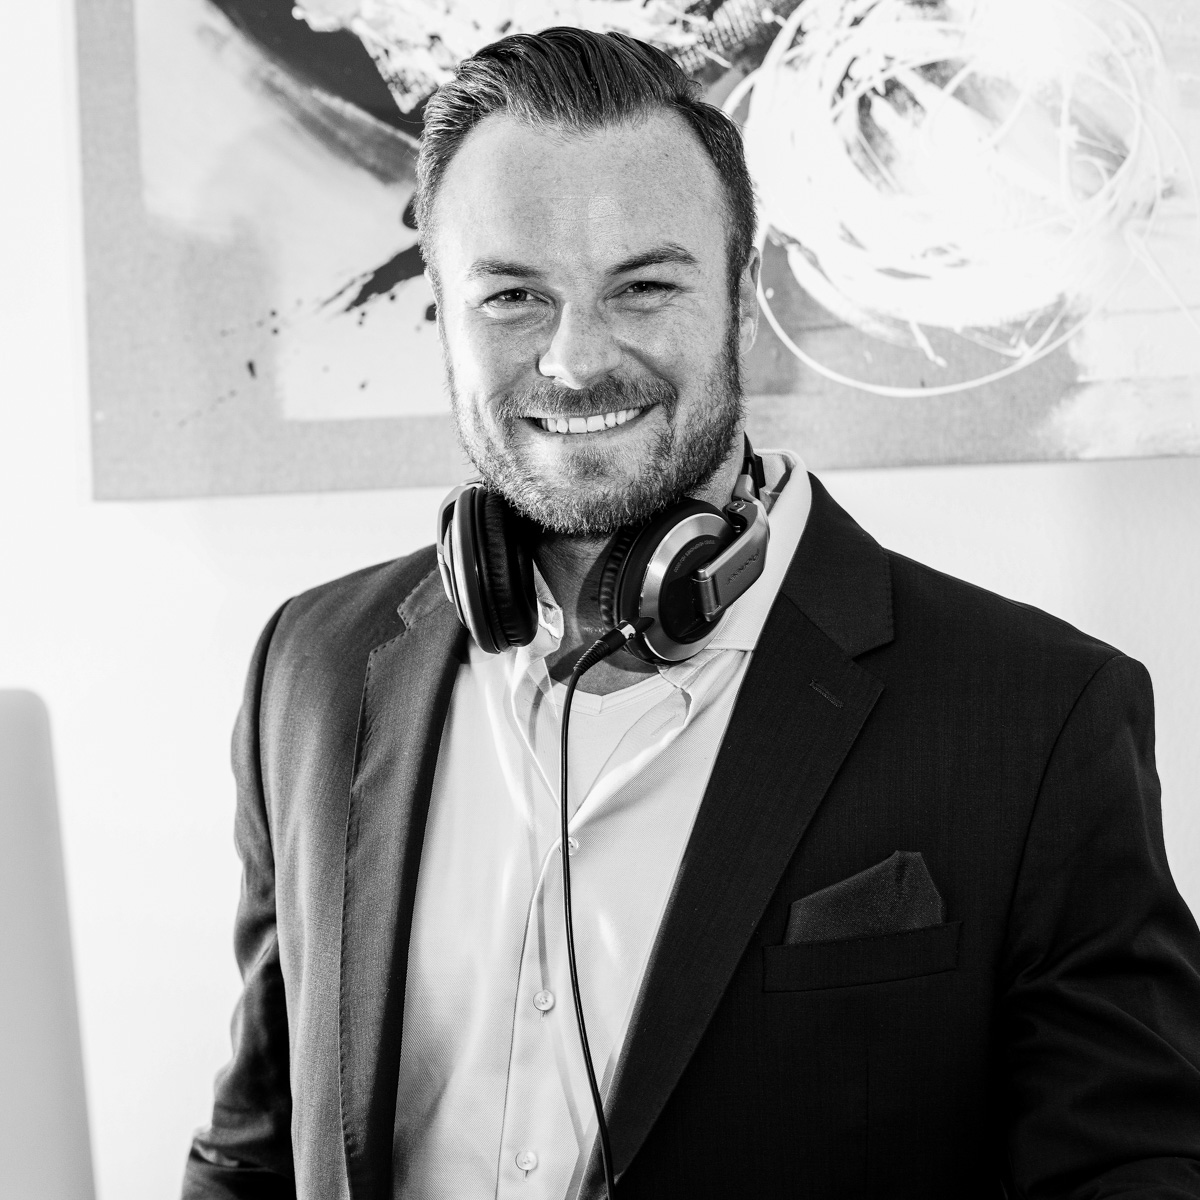 DJ |Hannover |Hochzeit |DJ |Nils |Remme |DJ |Firmenfeier |DJ |Geburtstag |DJ |Messeparty |DJ |Betriebsfeier |DJ |Sommerfest |DJ |Gala |Buchen |Mieten |Anfragen |Lehmann |Eventservice